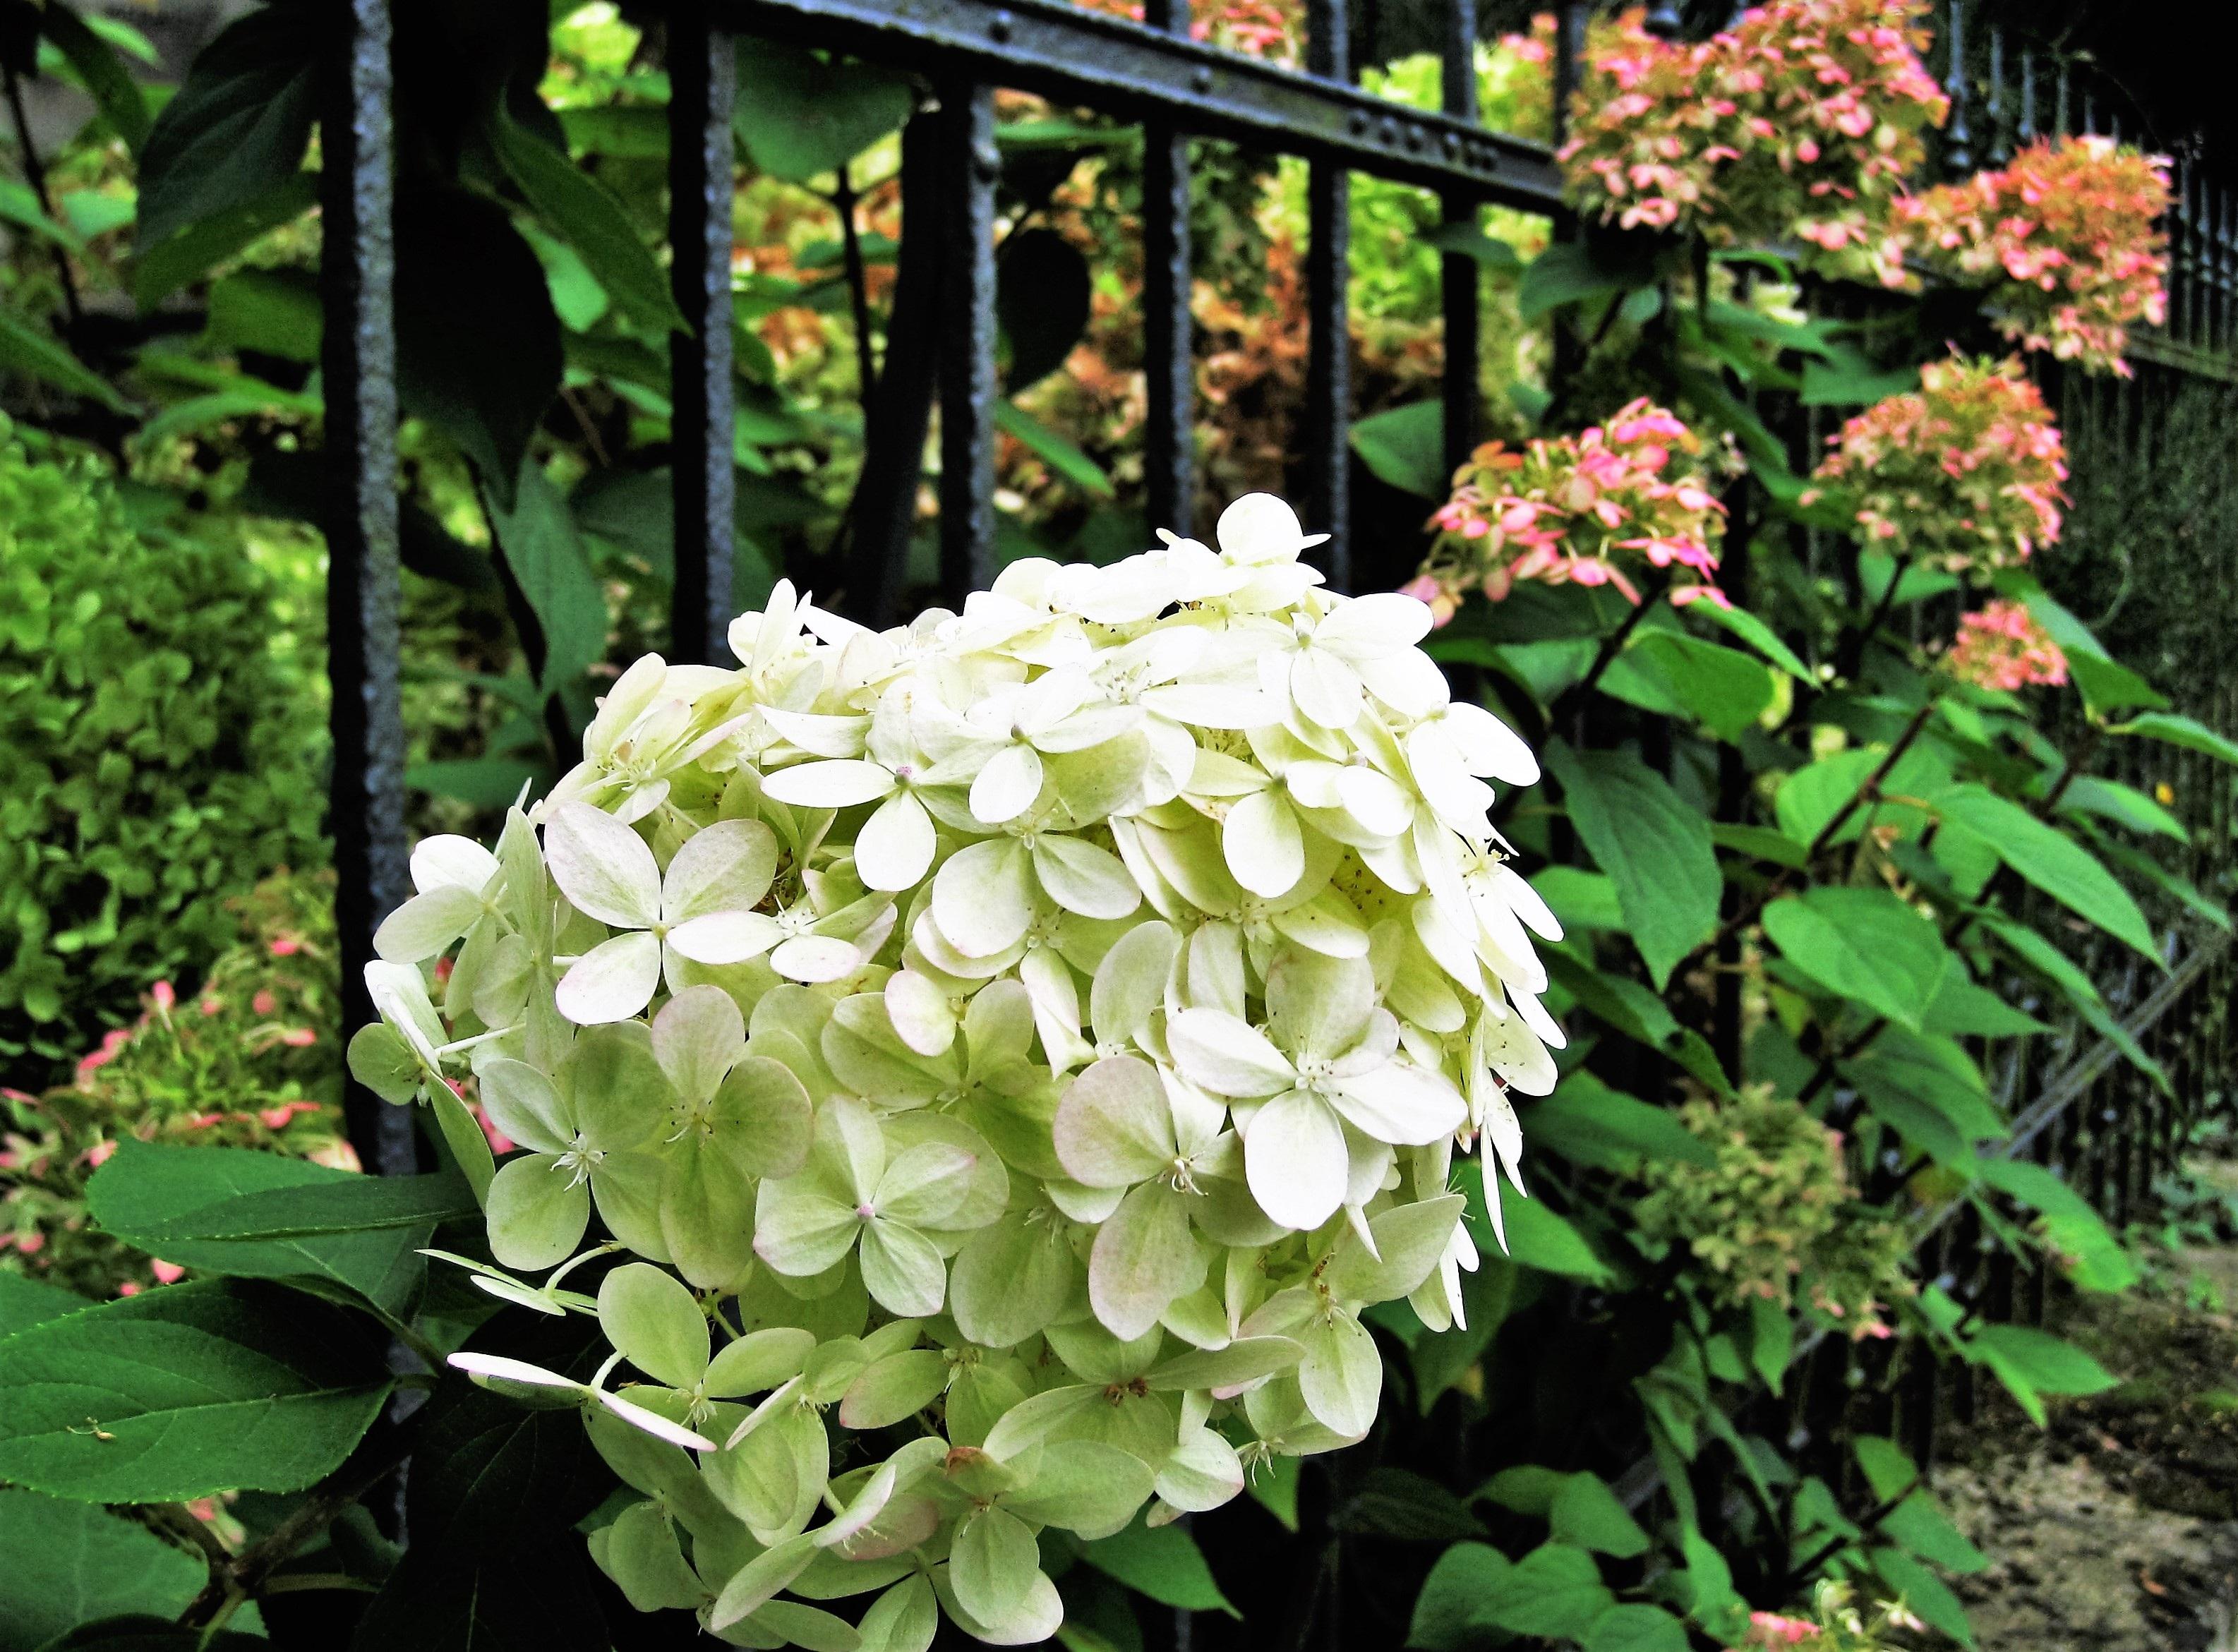 Free Images Nature Blossom White Bloom Rustic Bush Botany